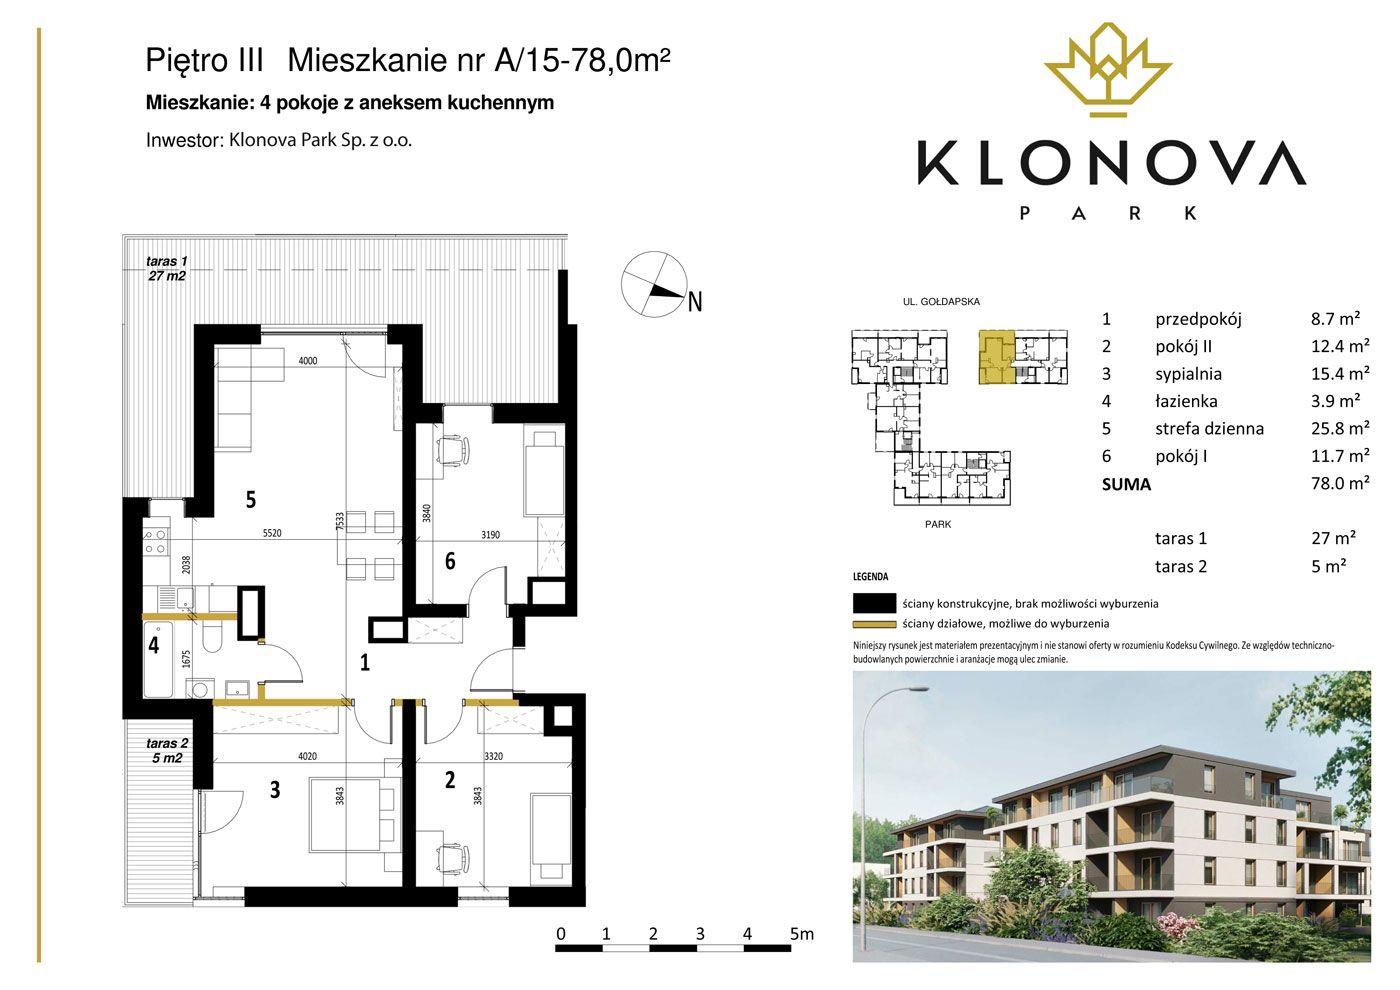 Apartamenty Klonova Park - Plan mieszkania A/15